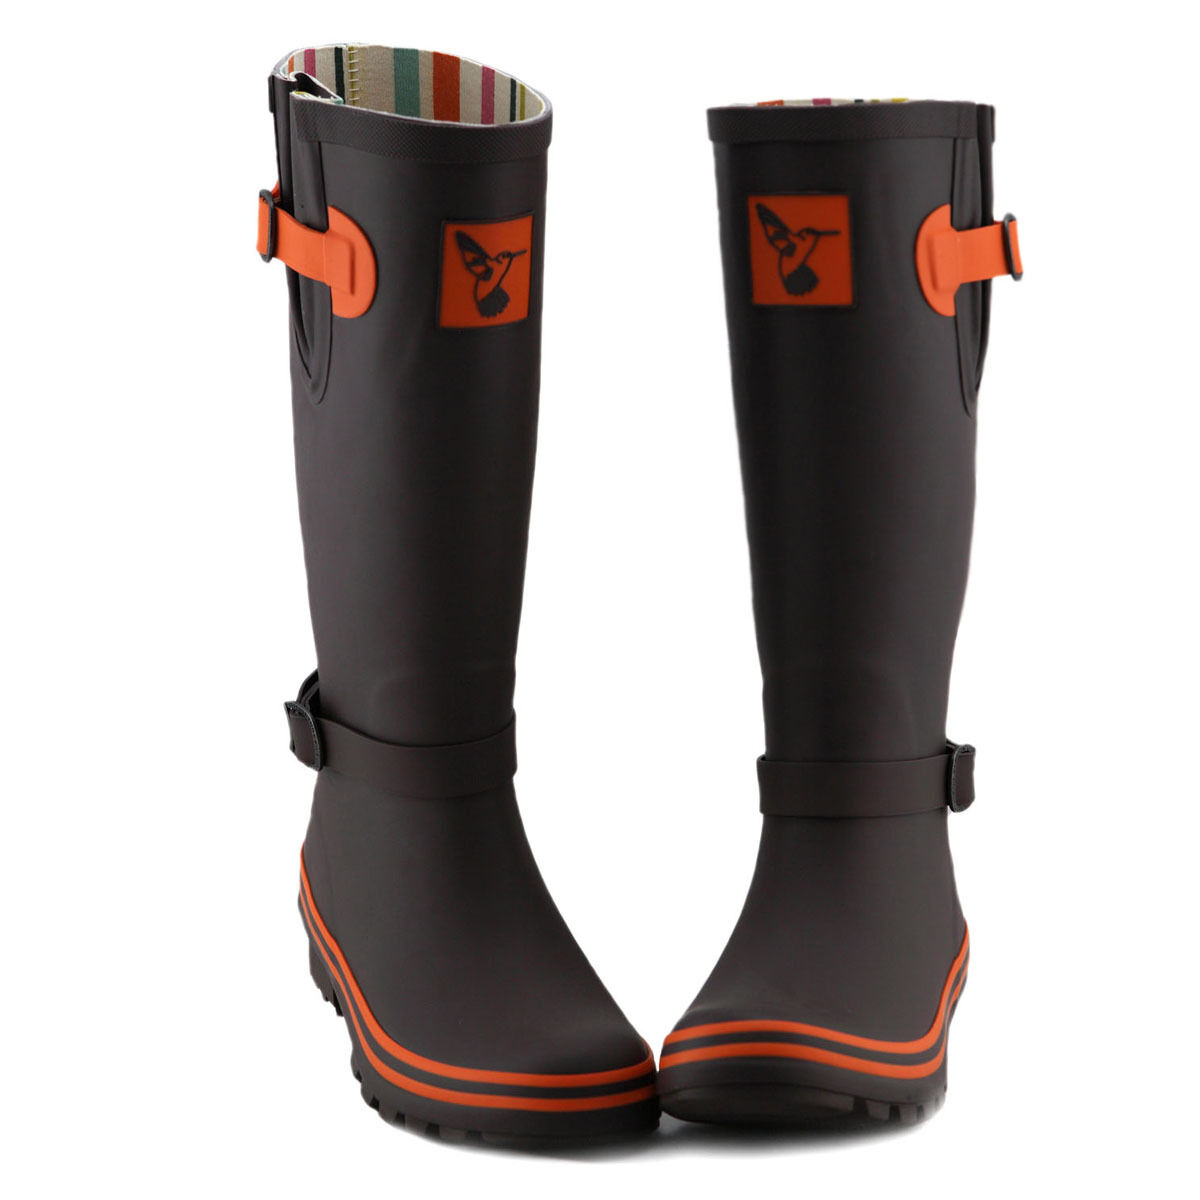 Evercreatures Ladies Knee-high Rain boots Wellies Rain-shoes Gumboots UK Brand